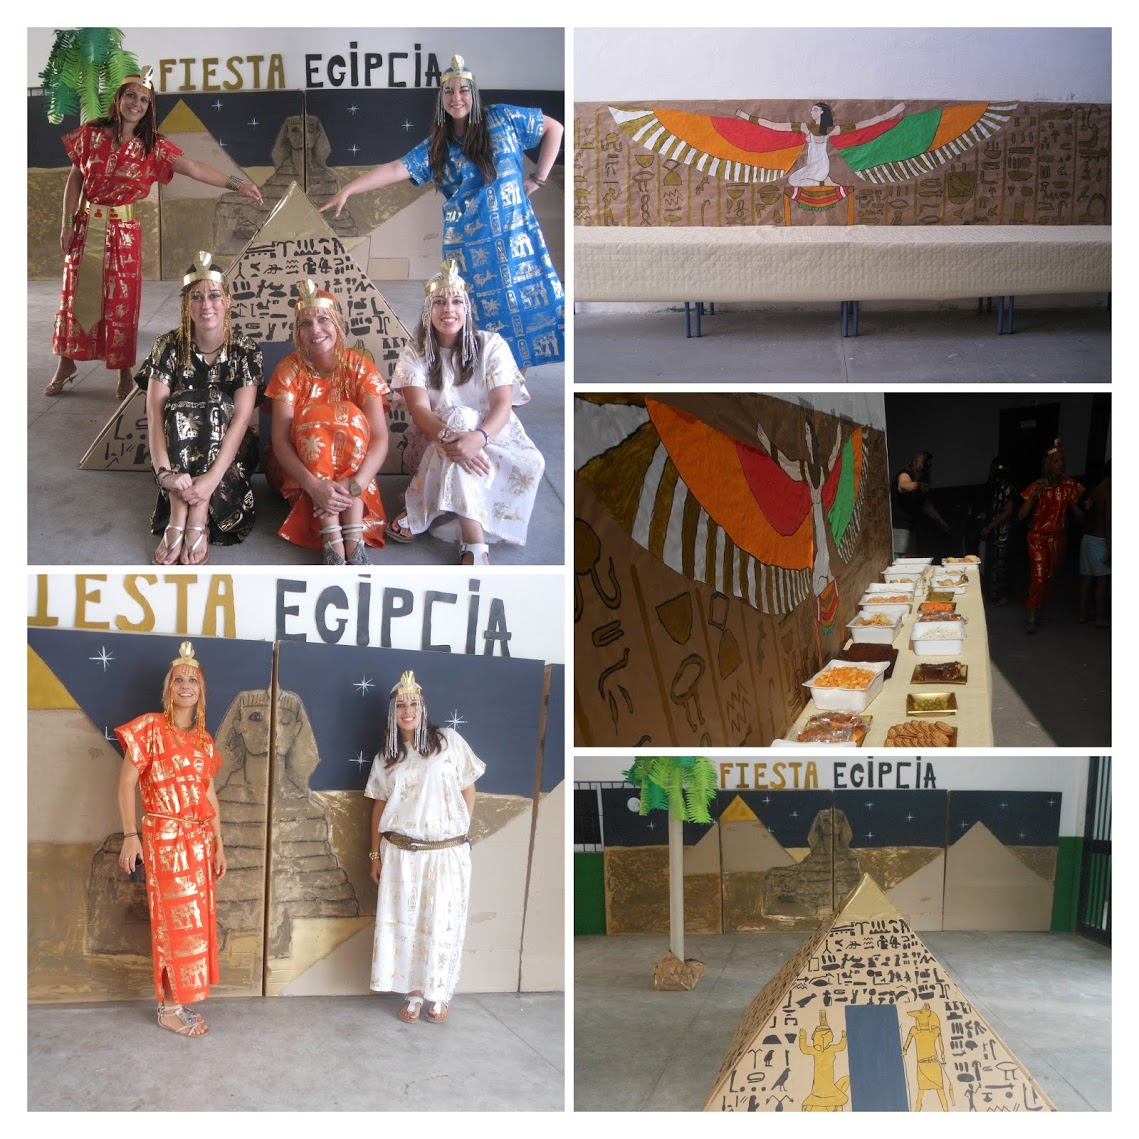 fiesta egipcia 2014